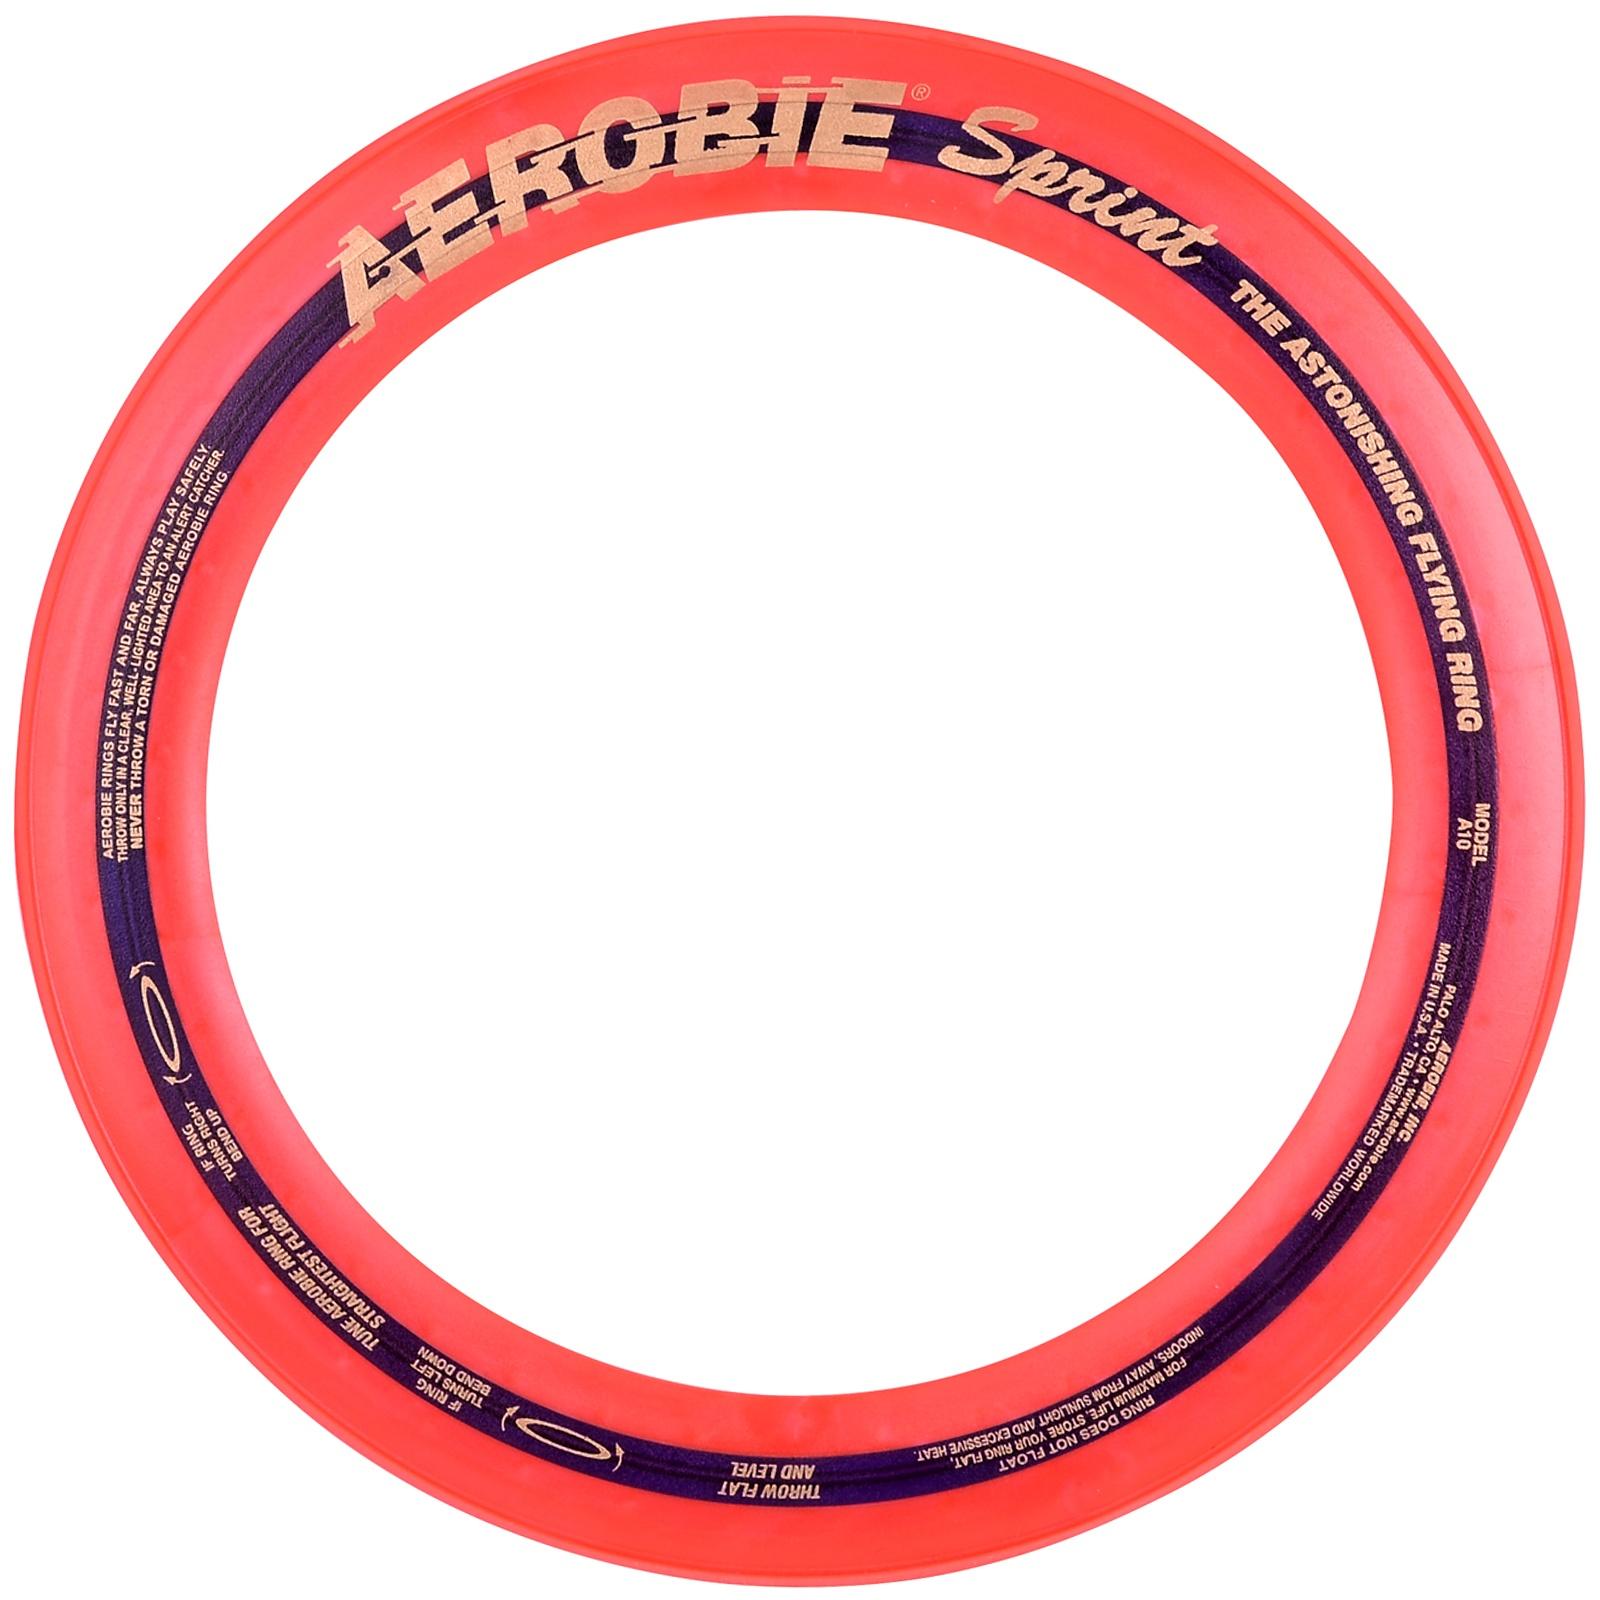 Létající kruh AEROBIE Sprint oranžový